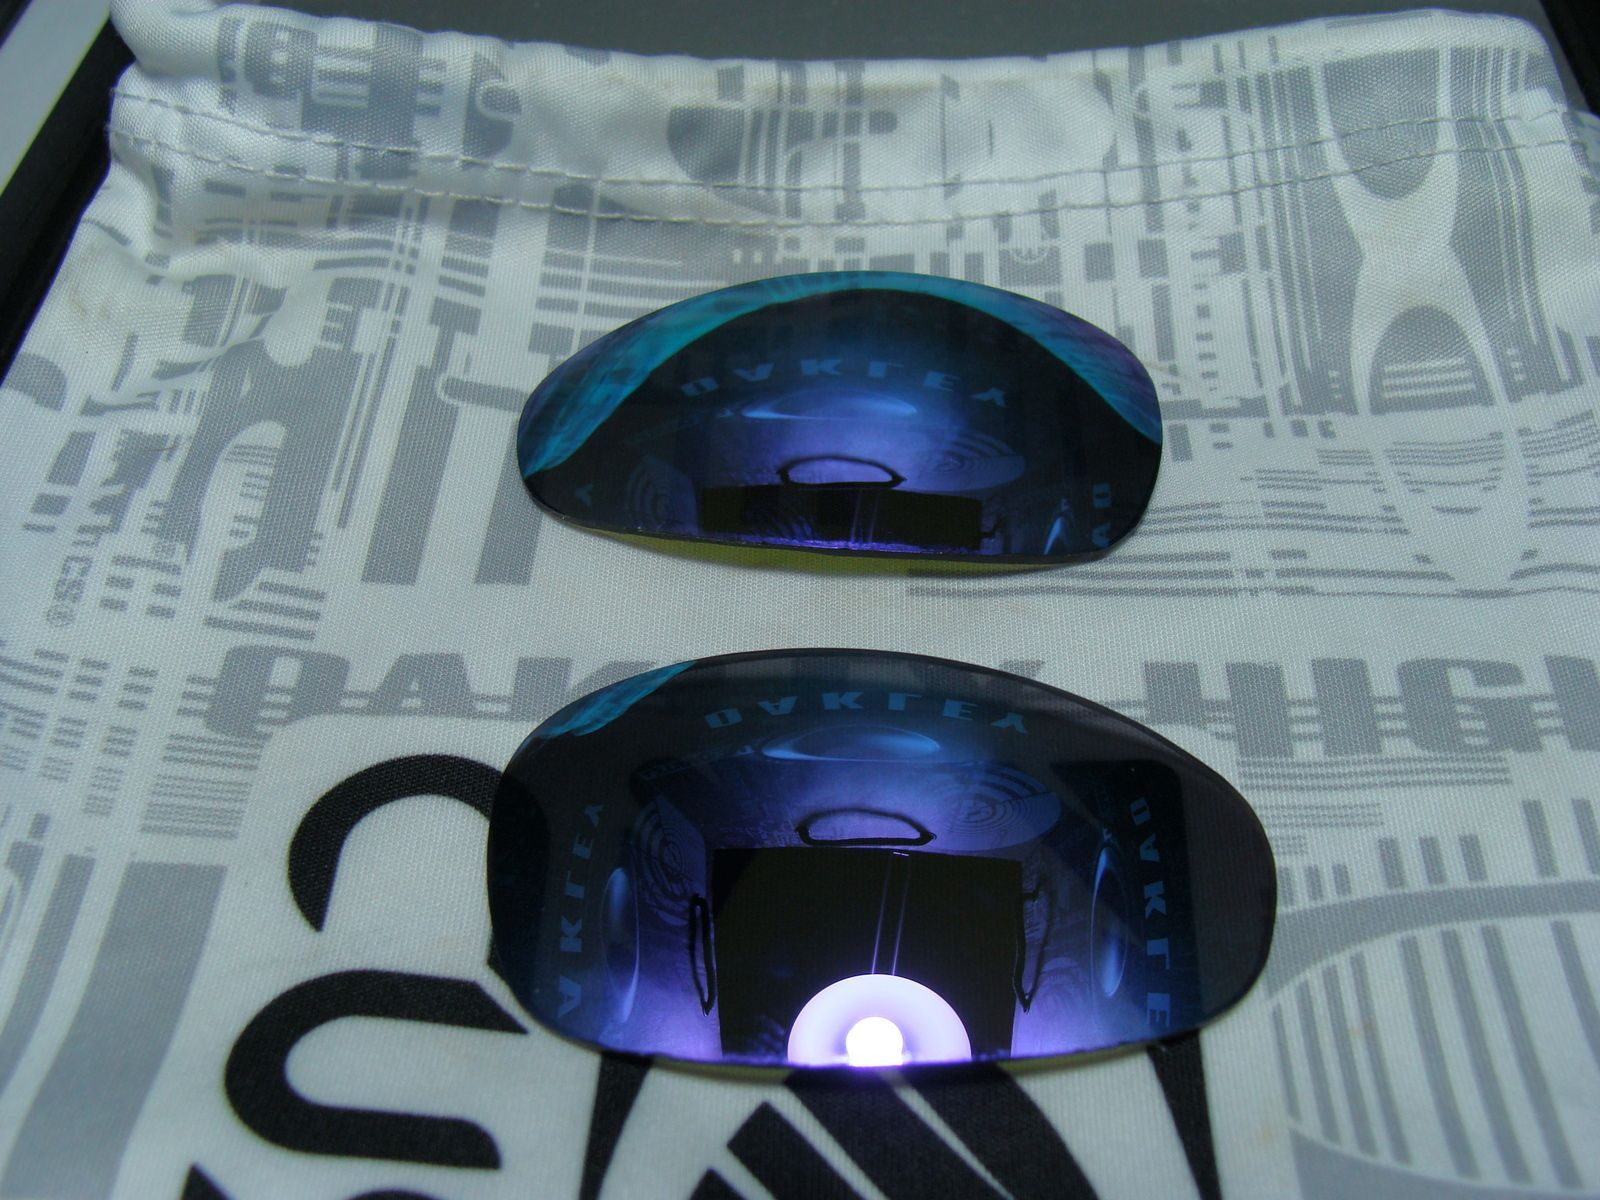 Custom Cut Violet Iridium Lenses For Juliet BNIB - dsc03858j.jpg